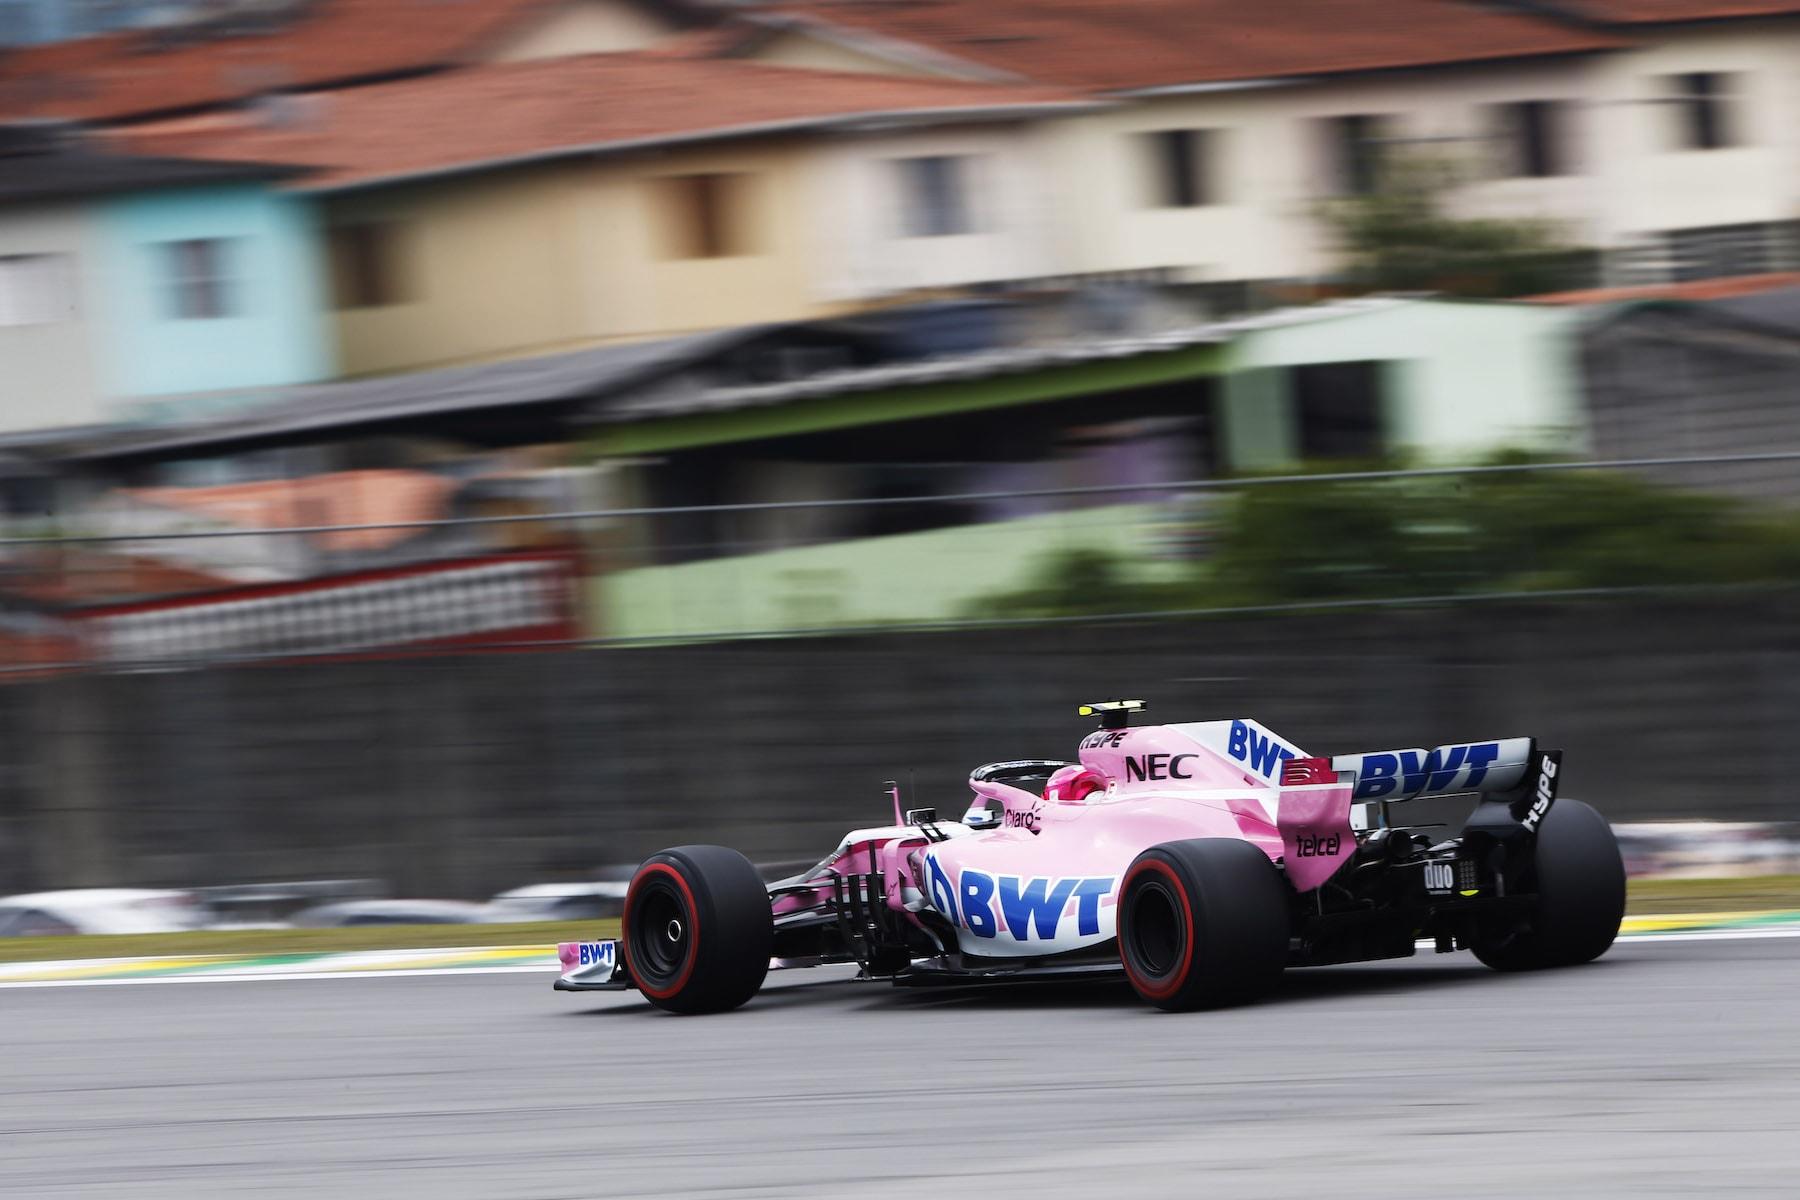 2018 Esteban Ocon | Force India VJM11 | 2018 Brazilian GP FP2 1 copy.jpg